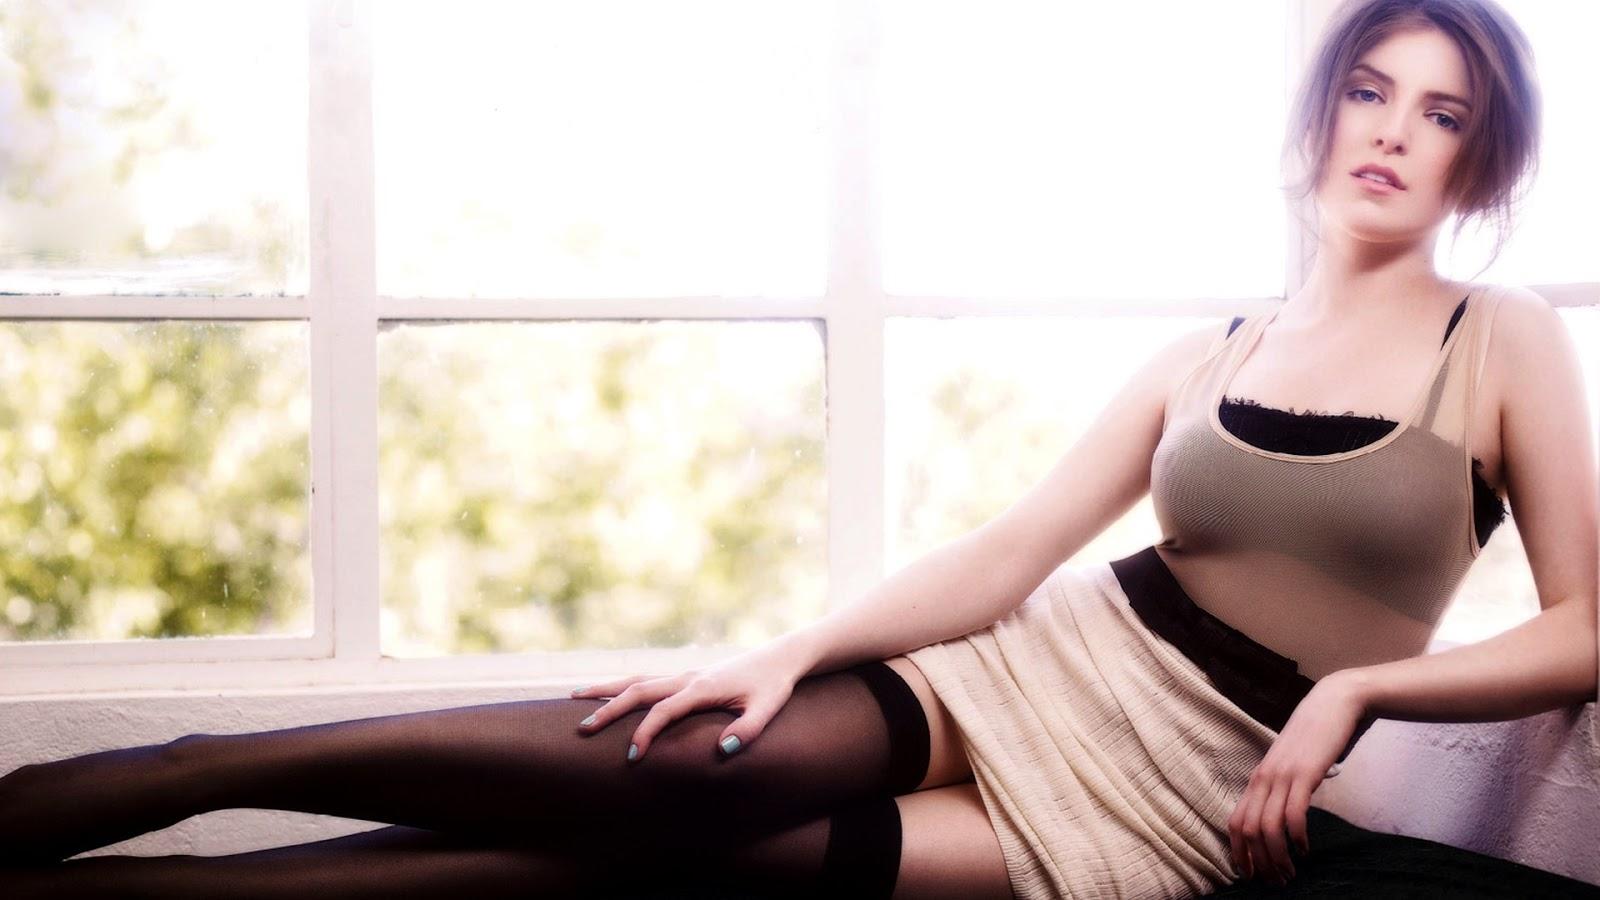 anna kendrick hot hd - photo #8